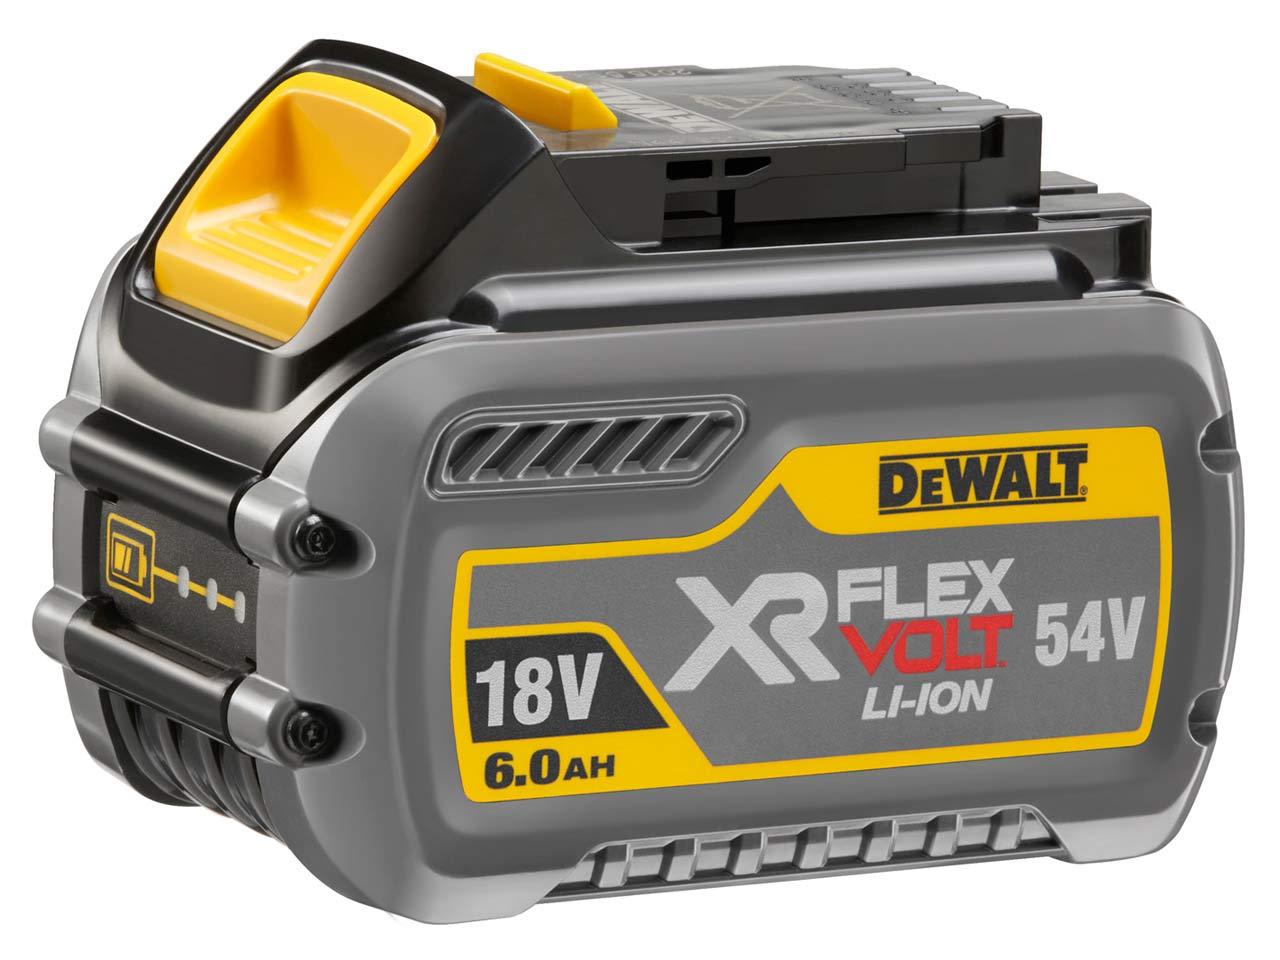 Аккумулятор Dewalt 54/18В 2/6Ач li-ion (dcb546-xj 54 В xr flexvolt) аккумулятор dewalt 18в 1 5ач li ion 0 36кг xr серия dcb 181